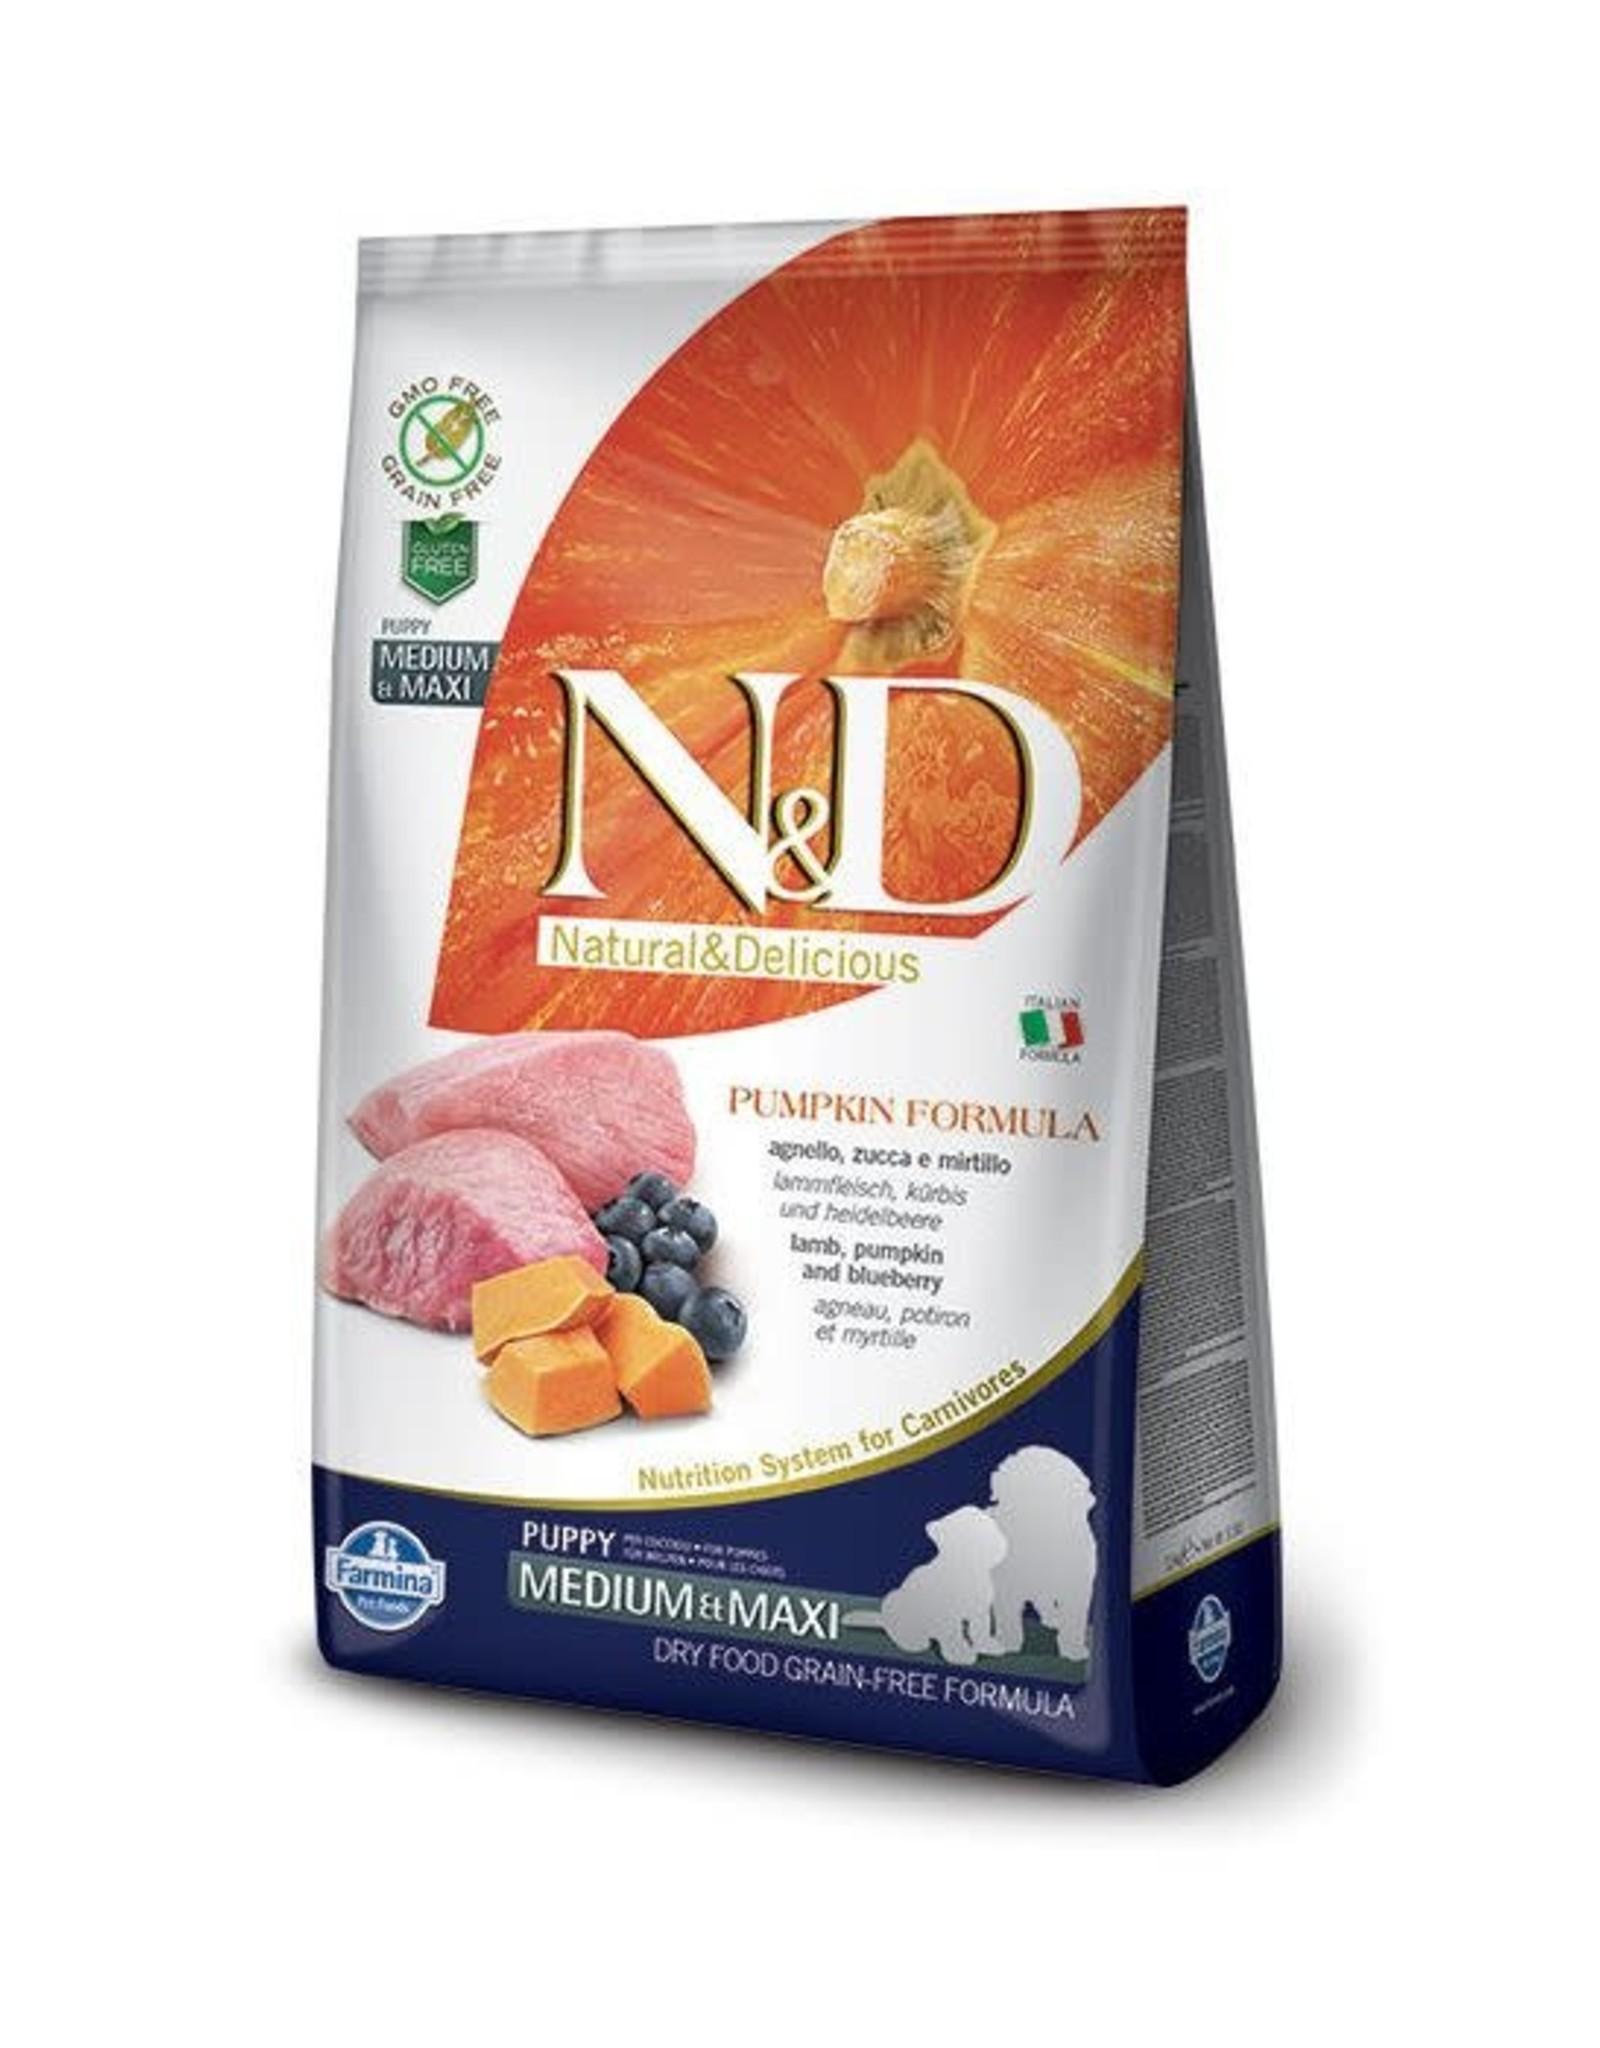 N&D Dog Lamb & Blueberry w/Pumpkin Puppy Med/Maxi 5.5LB